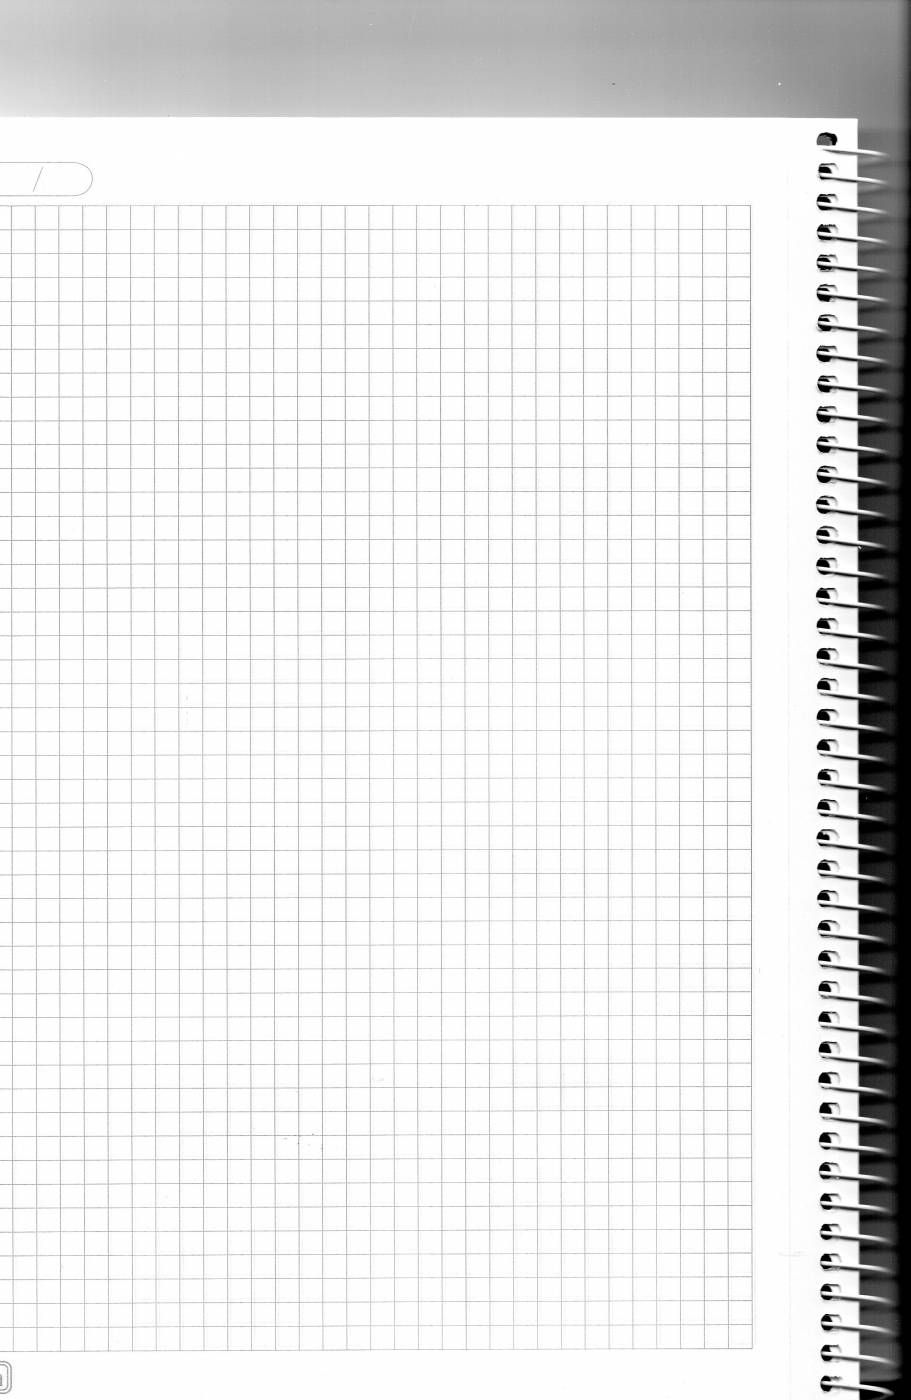 Caderno Lunix Tilibra Quadriculado 5 mm x 5 mm Preto